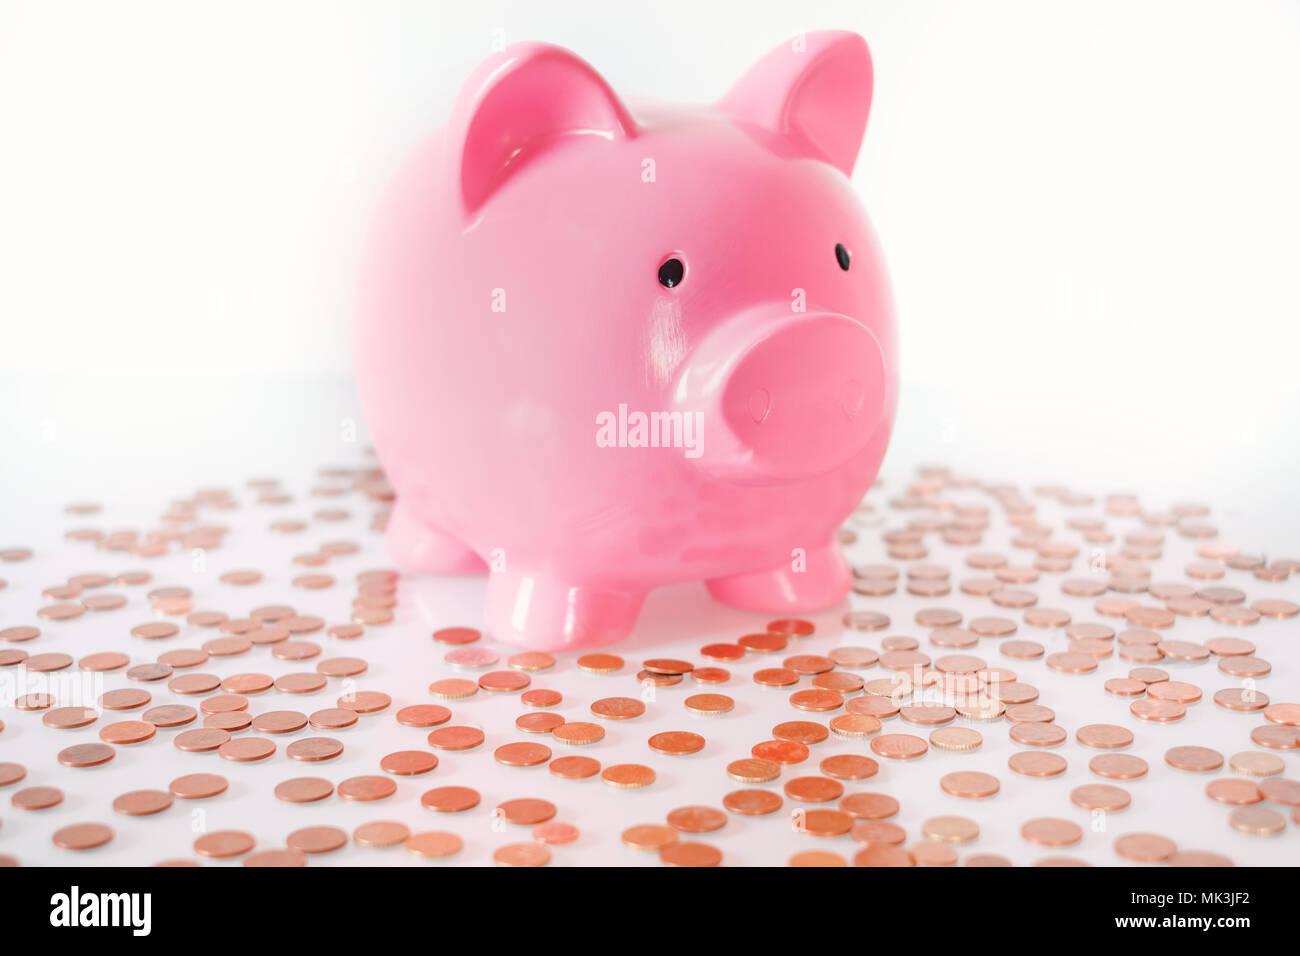 Piggy Bank Money Saving Finance Concept.Piggy bank isolated on white background. - Stock Image